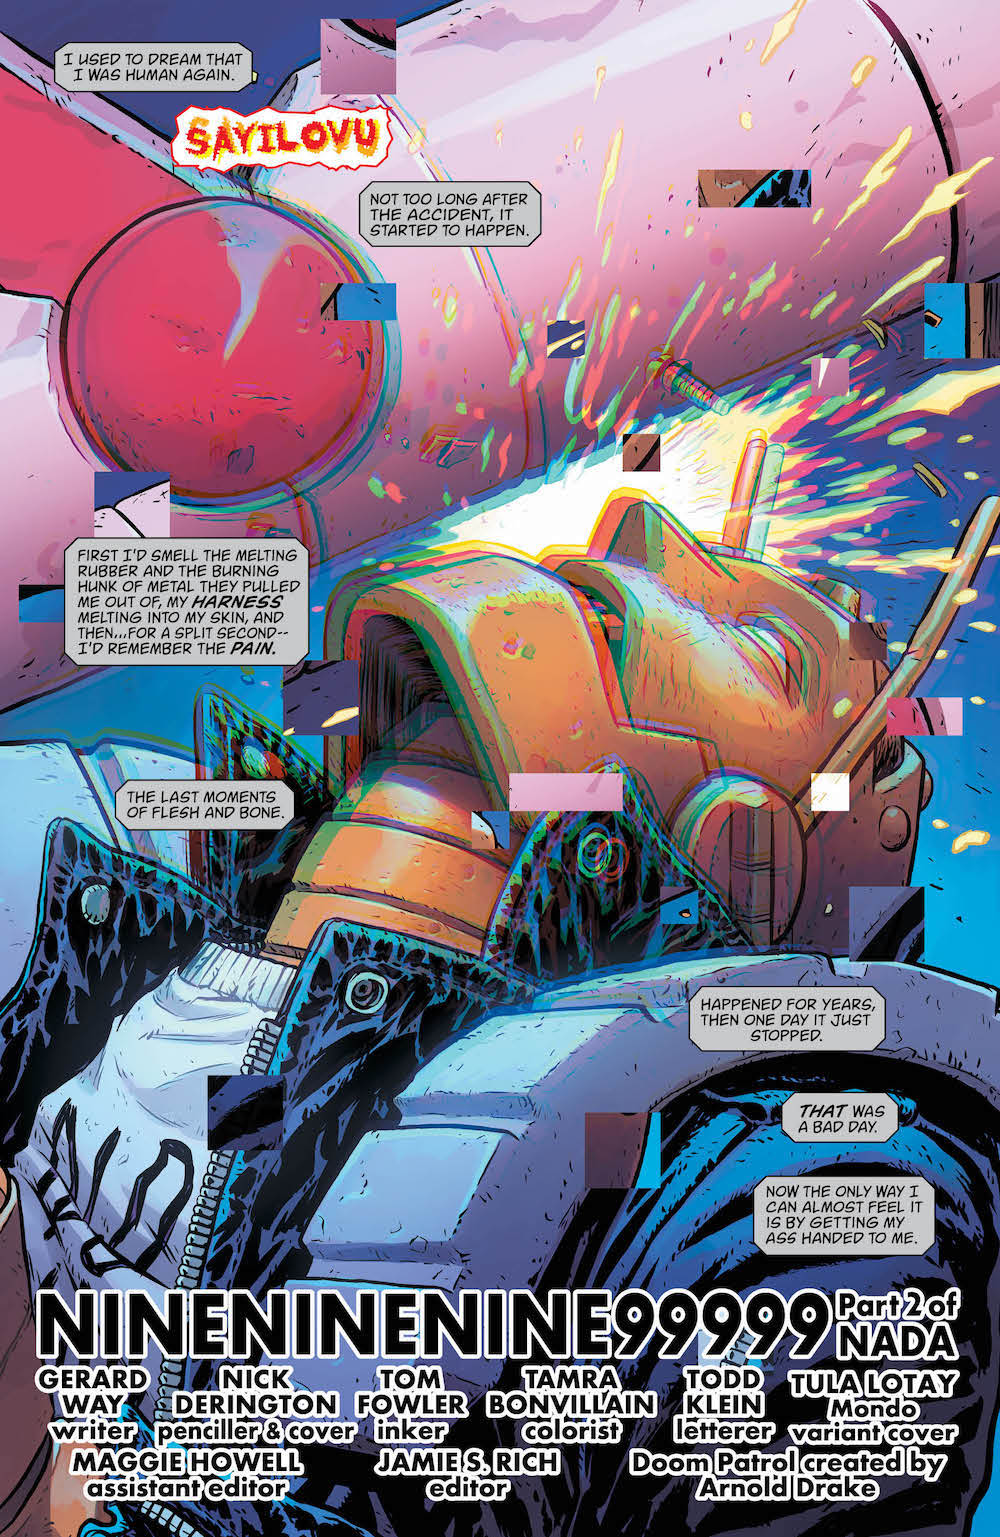 Robotman, Doom Patrol #9, 2017